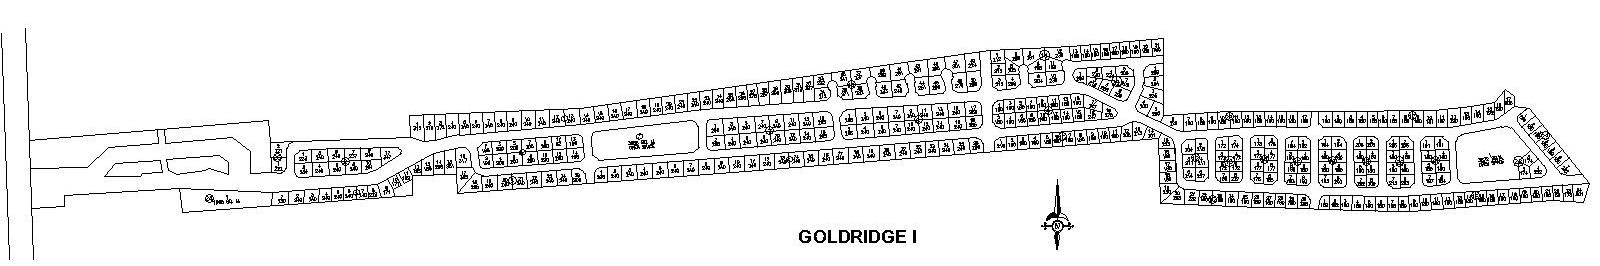 GOLDRIDGE I